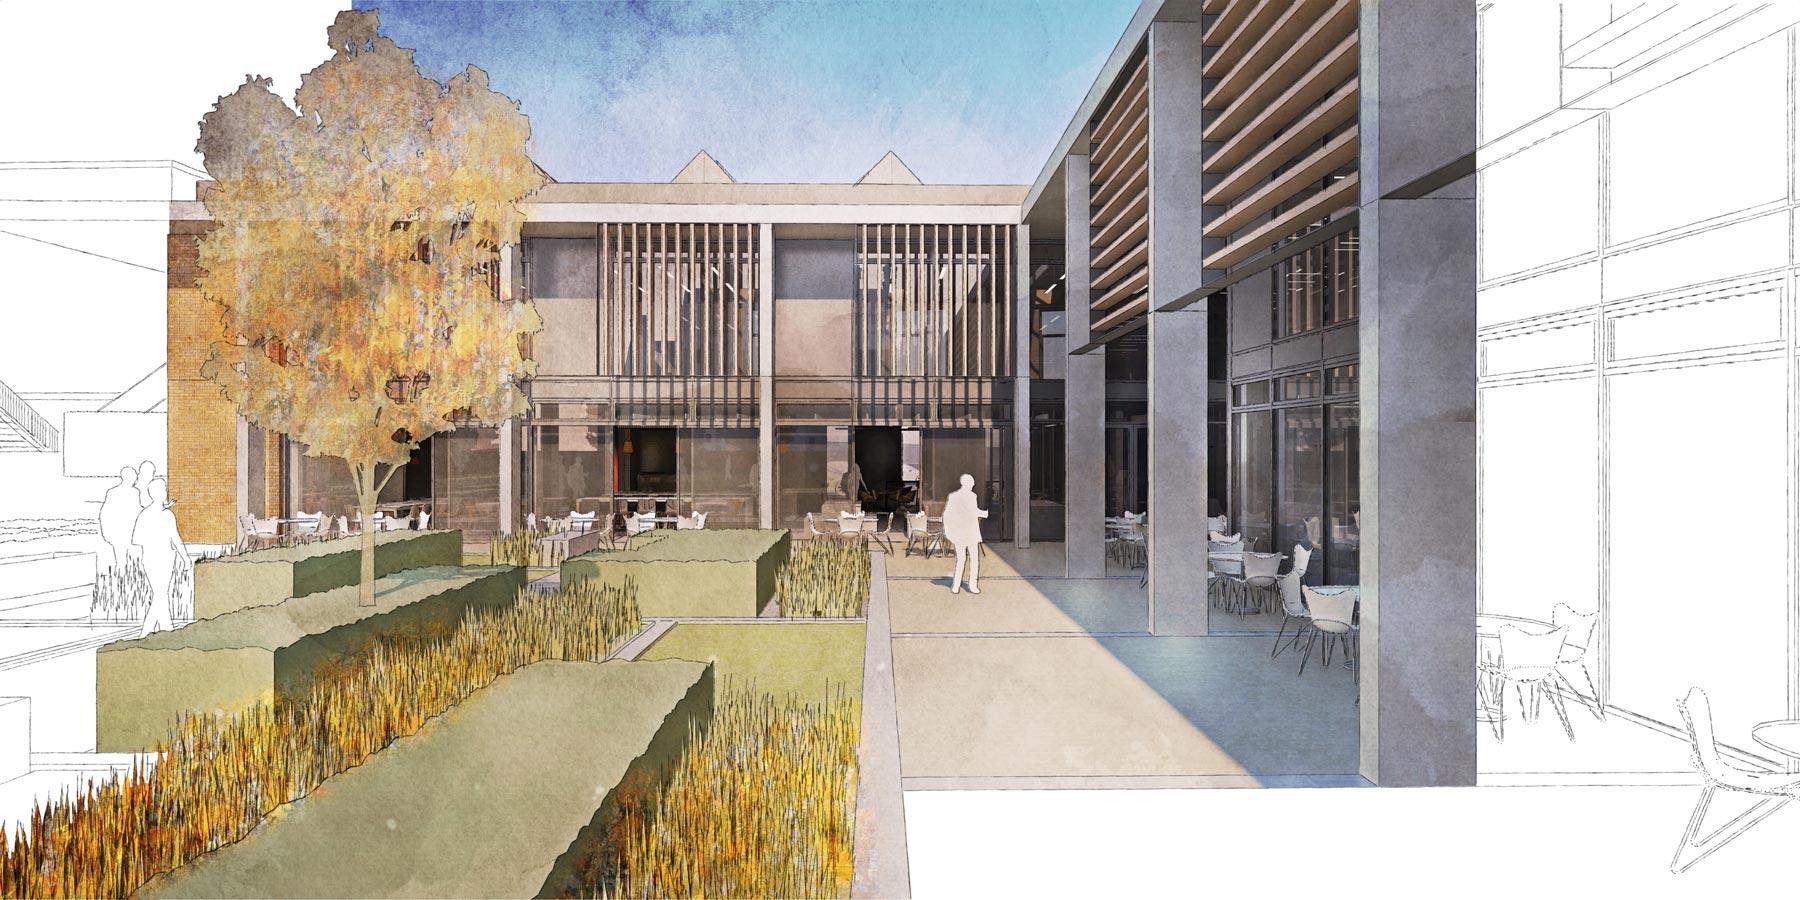 Berkhamsted 6th form Quad illustration